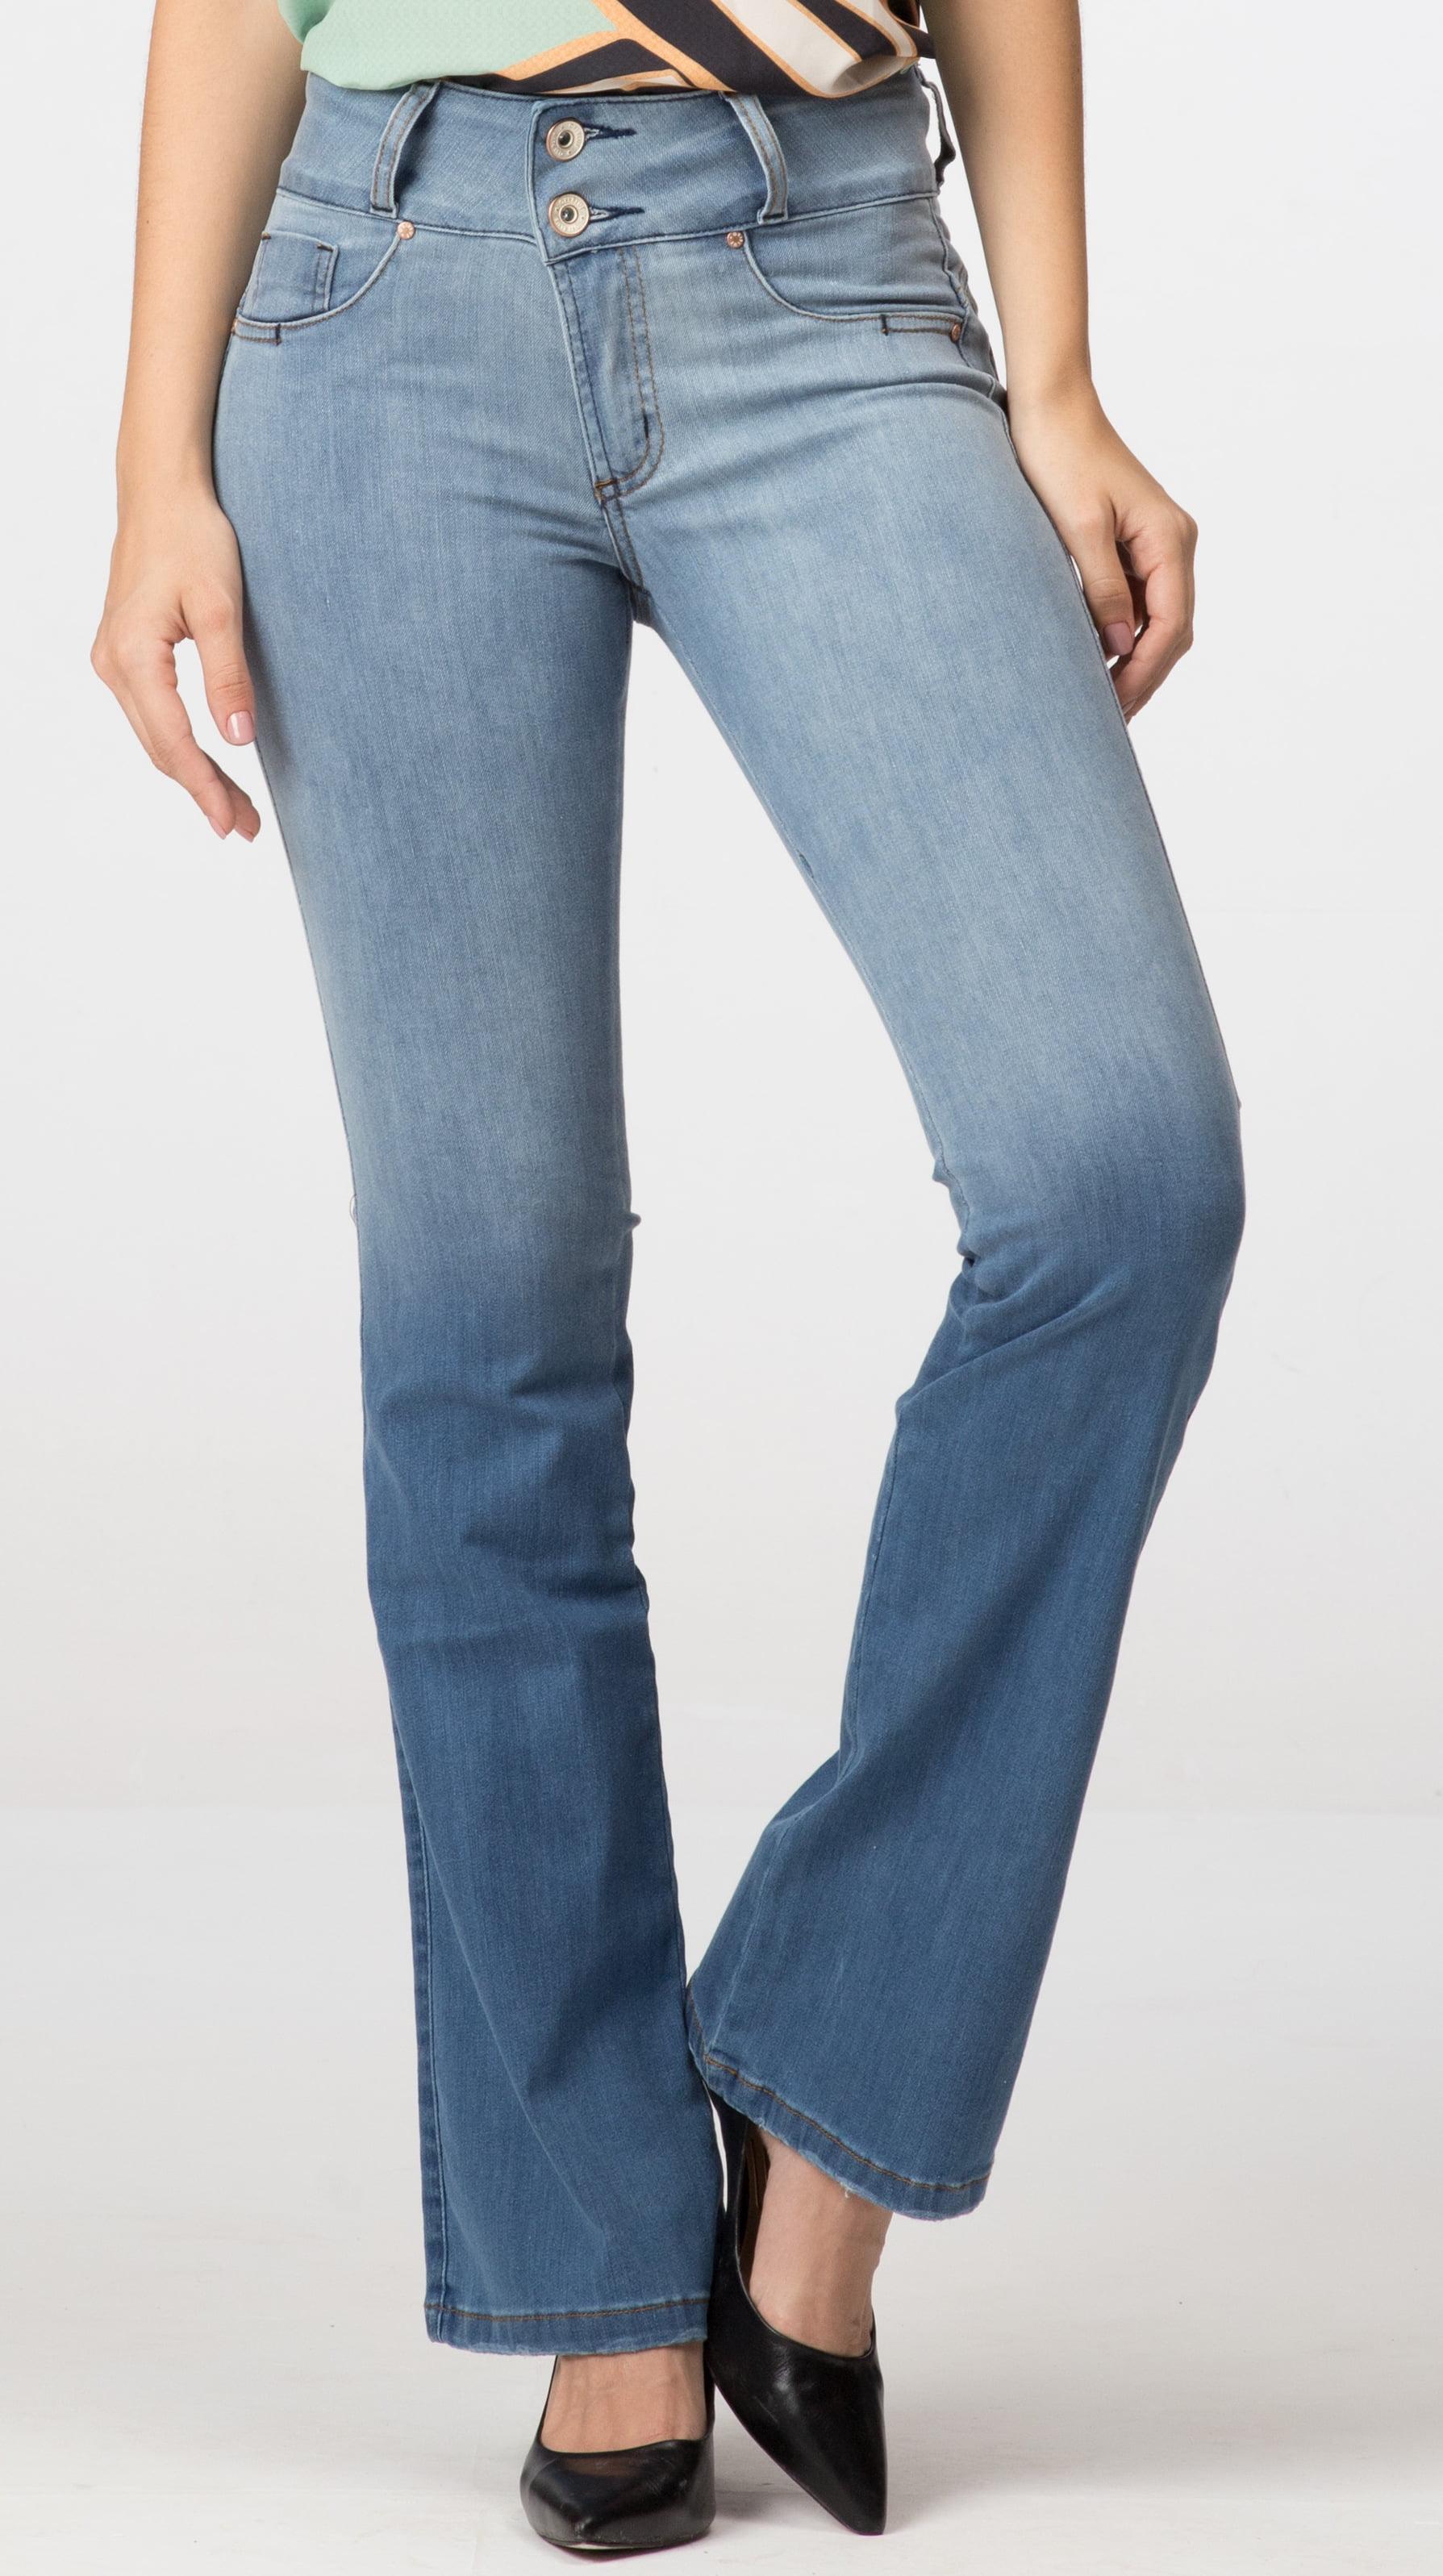 Calça Flare Jeans Levanta Bumbum F2020305